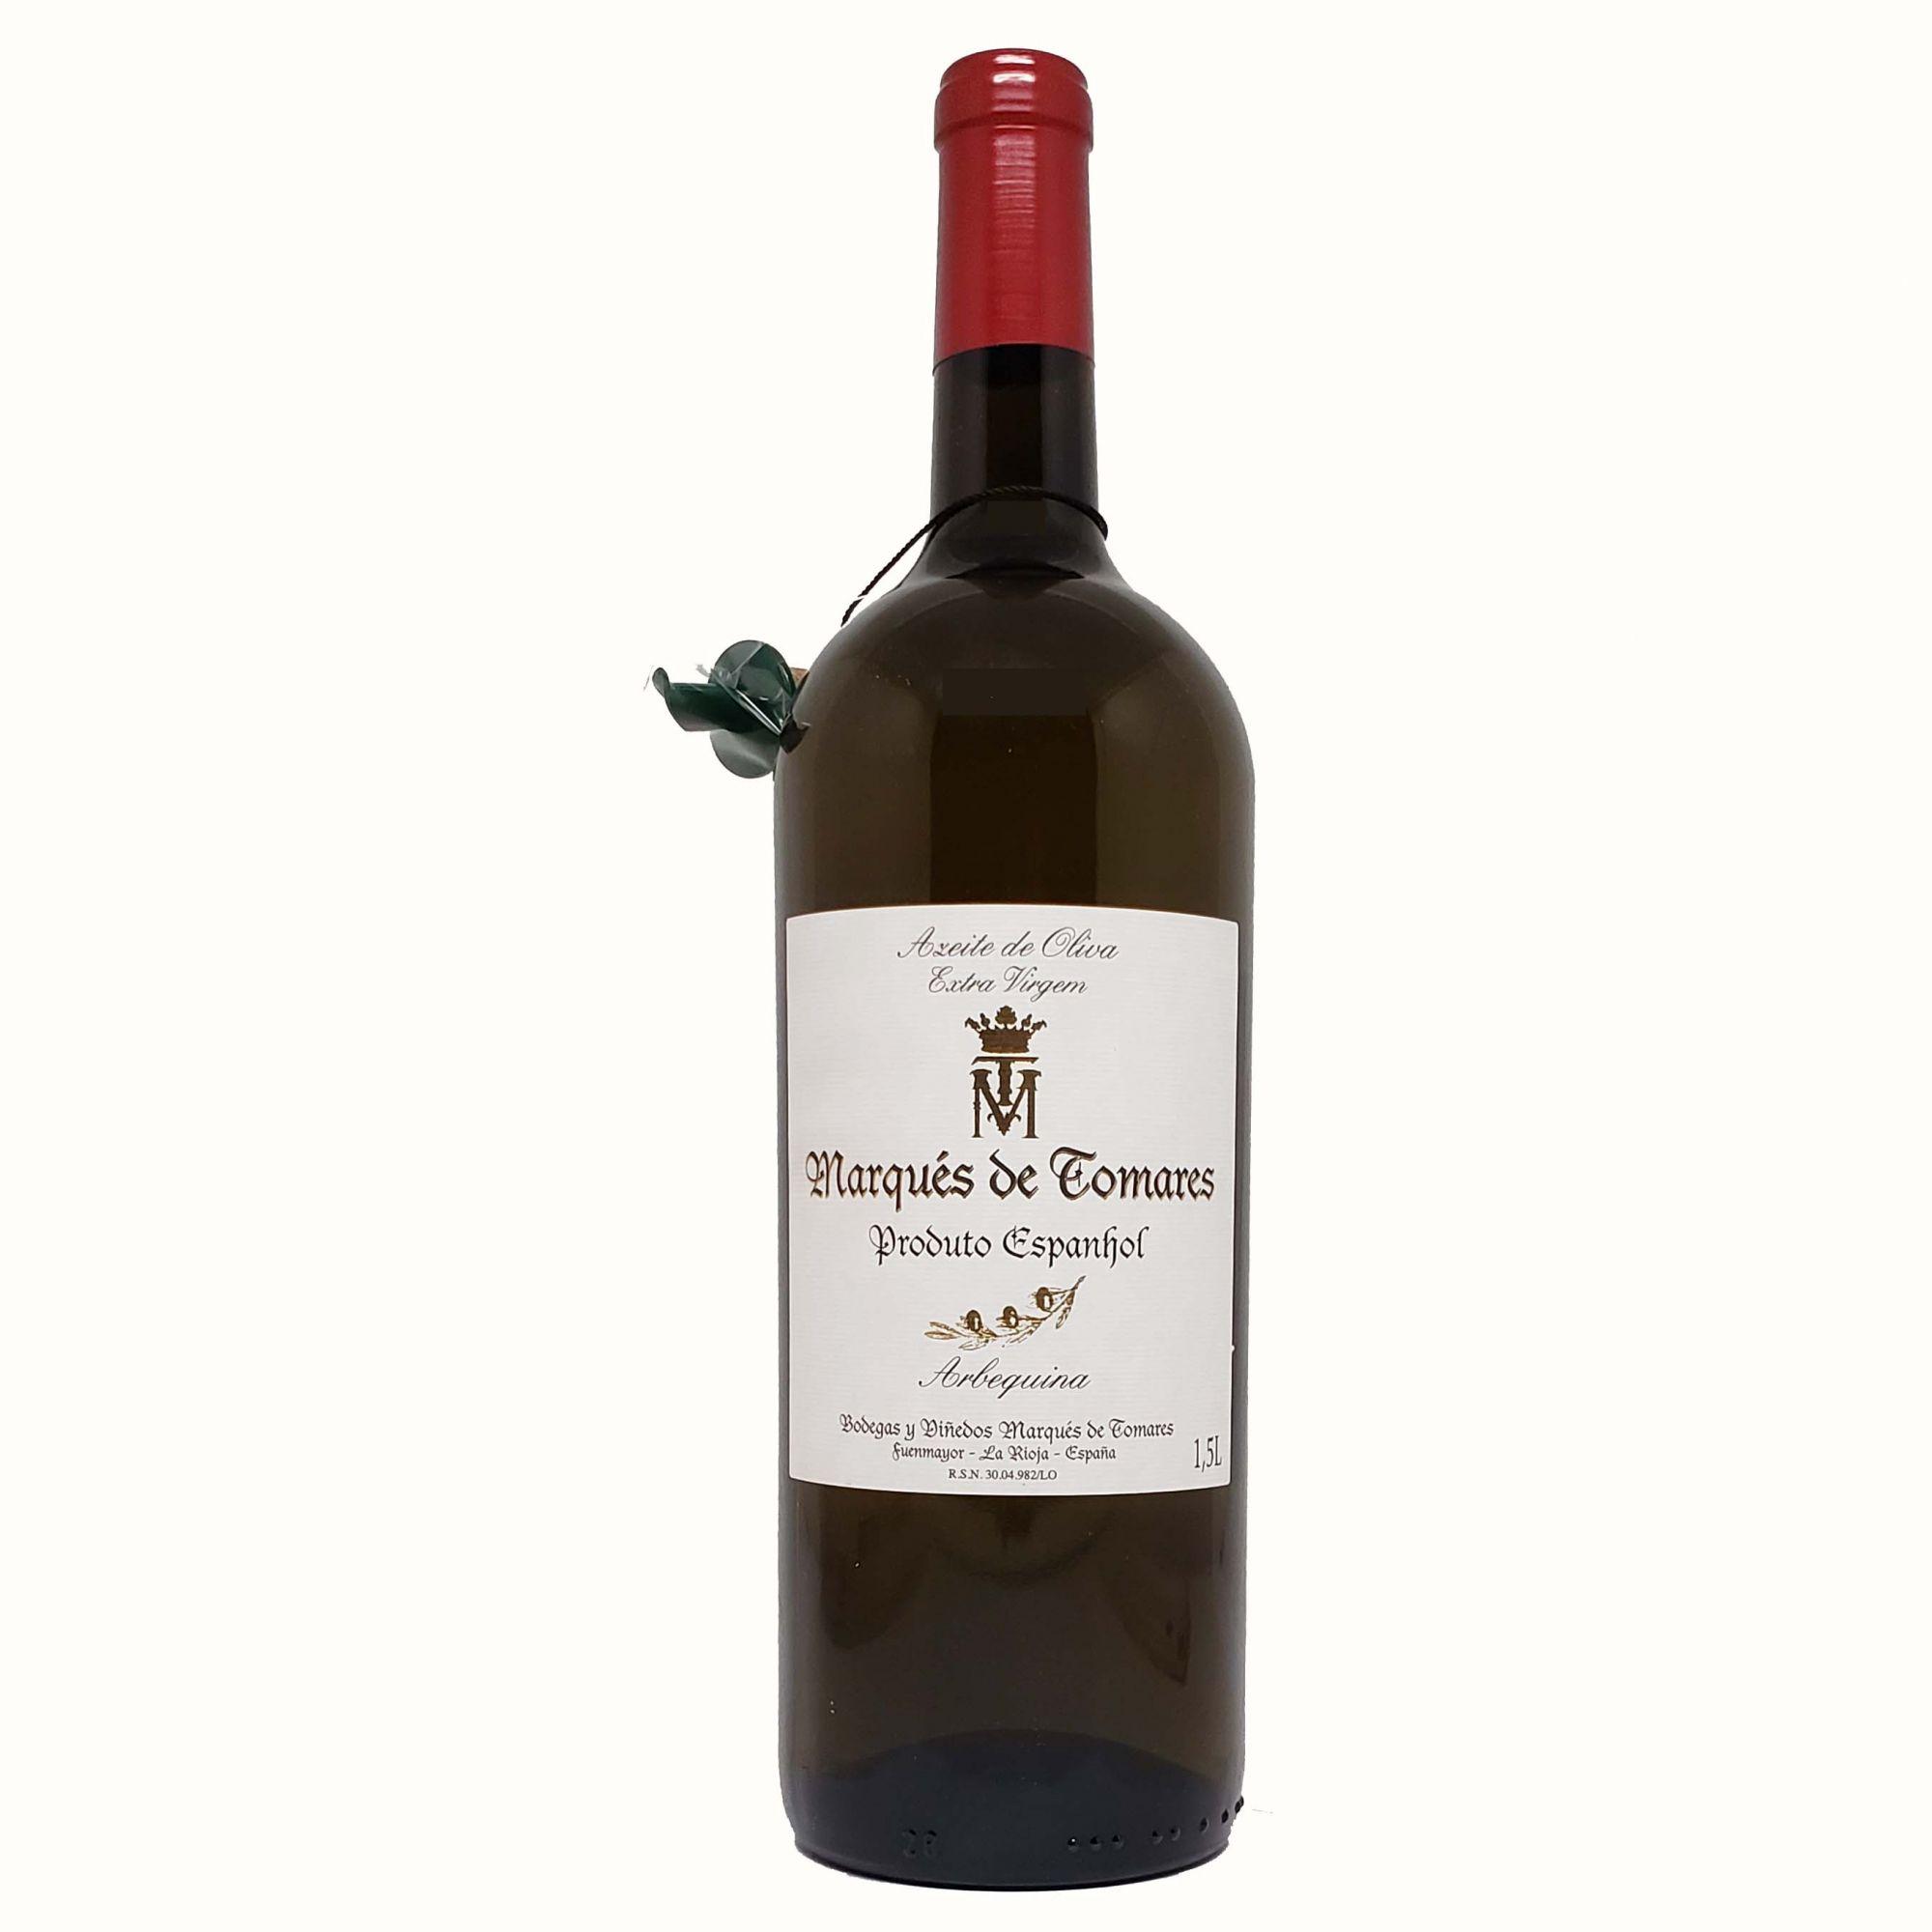 Azeite de Oliva Extra Virgem Marqués de Tomares - 1,5L -